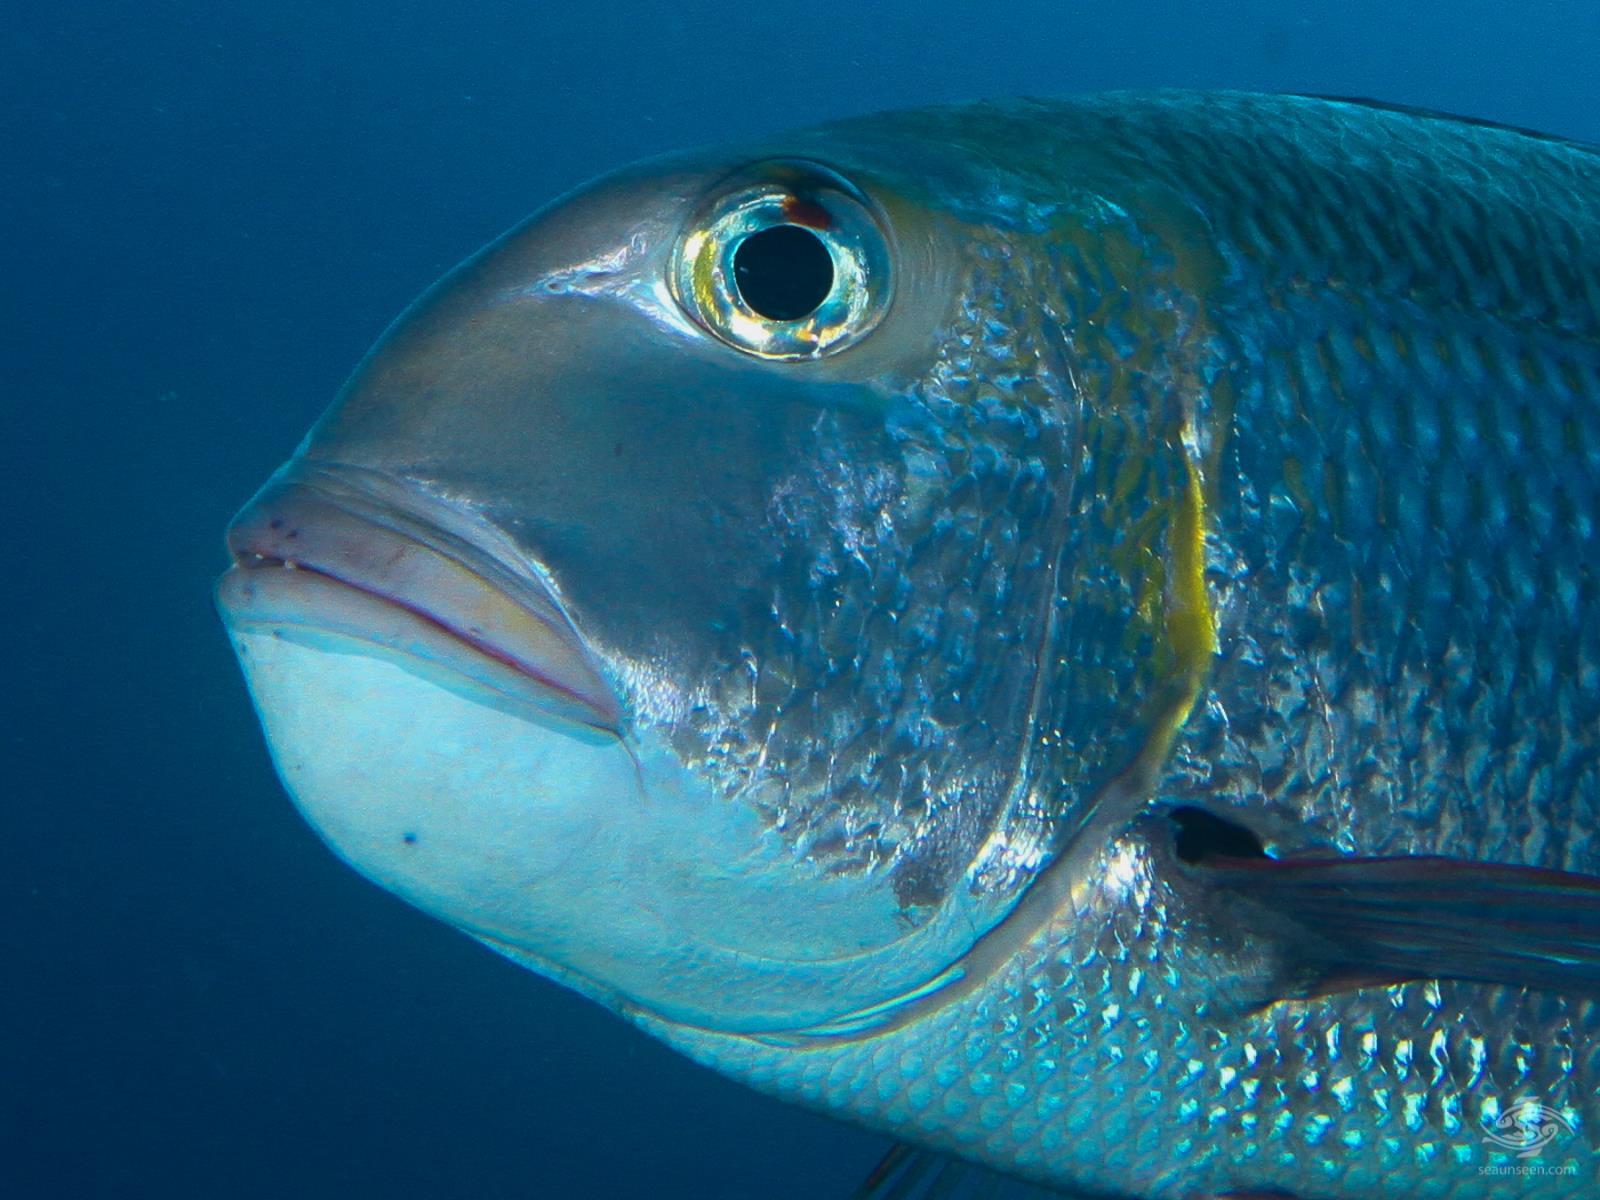 Big eyed bream Kinasi Pass - Mafia Island, Tanzania dive sites